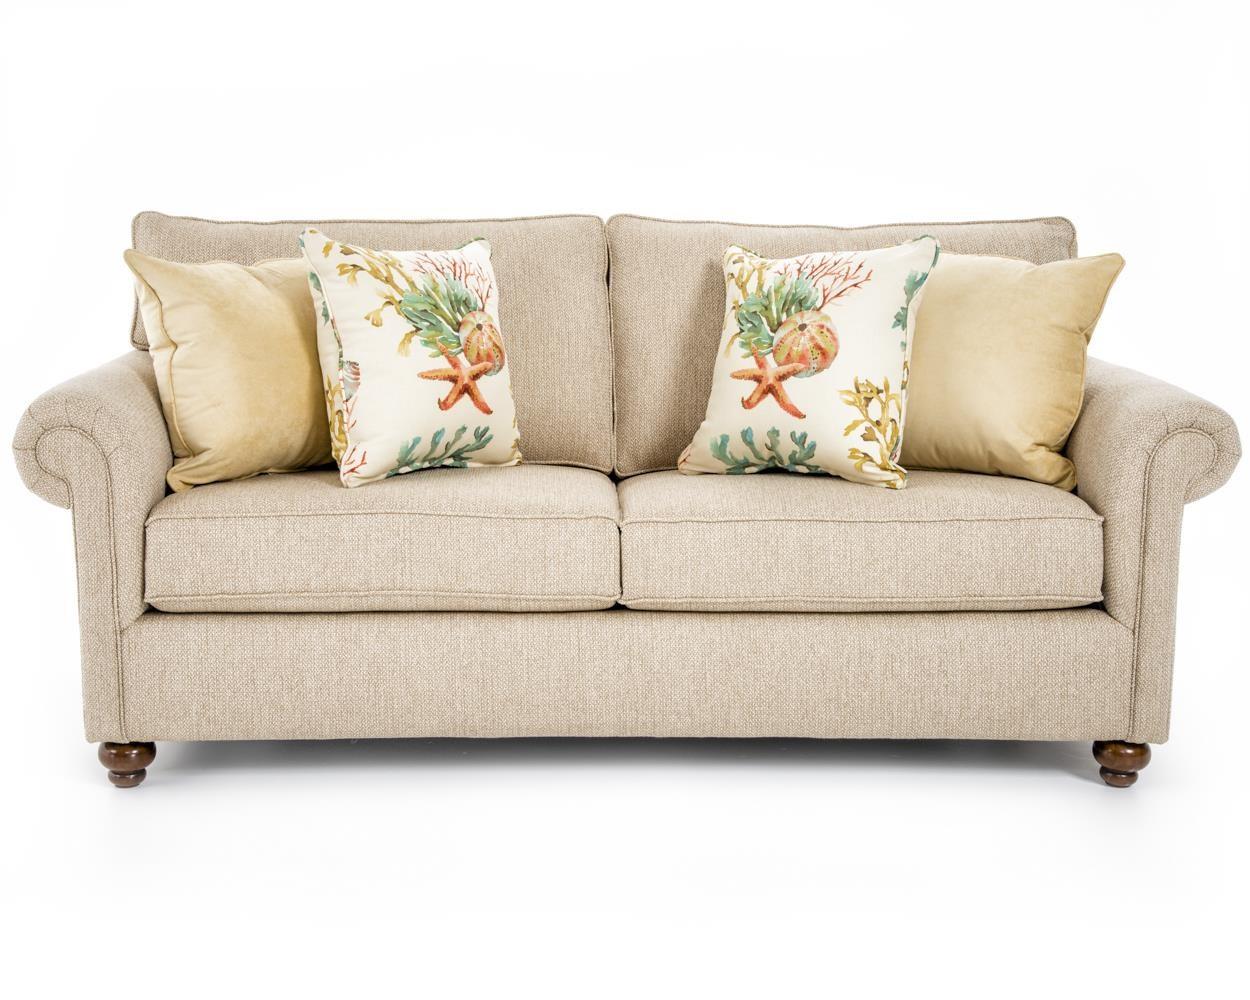 Broyhill Furniture Judd Sofa - Item Number: 4262-3-4190-08